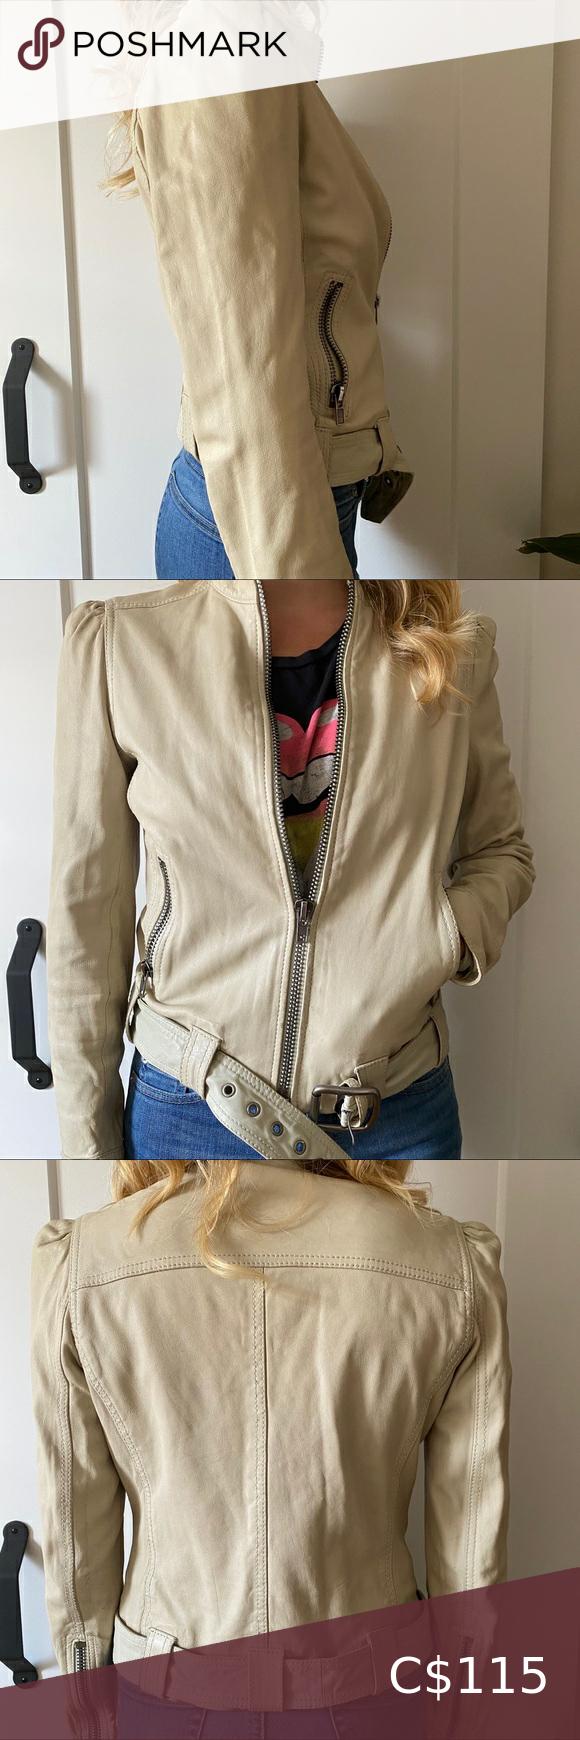 Rudsak Beige Leather Jacket Beige Leather Jacket Leather Jacket Clothes Design [ 1740 x 580 Pixel ]